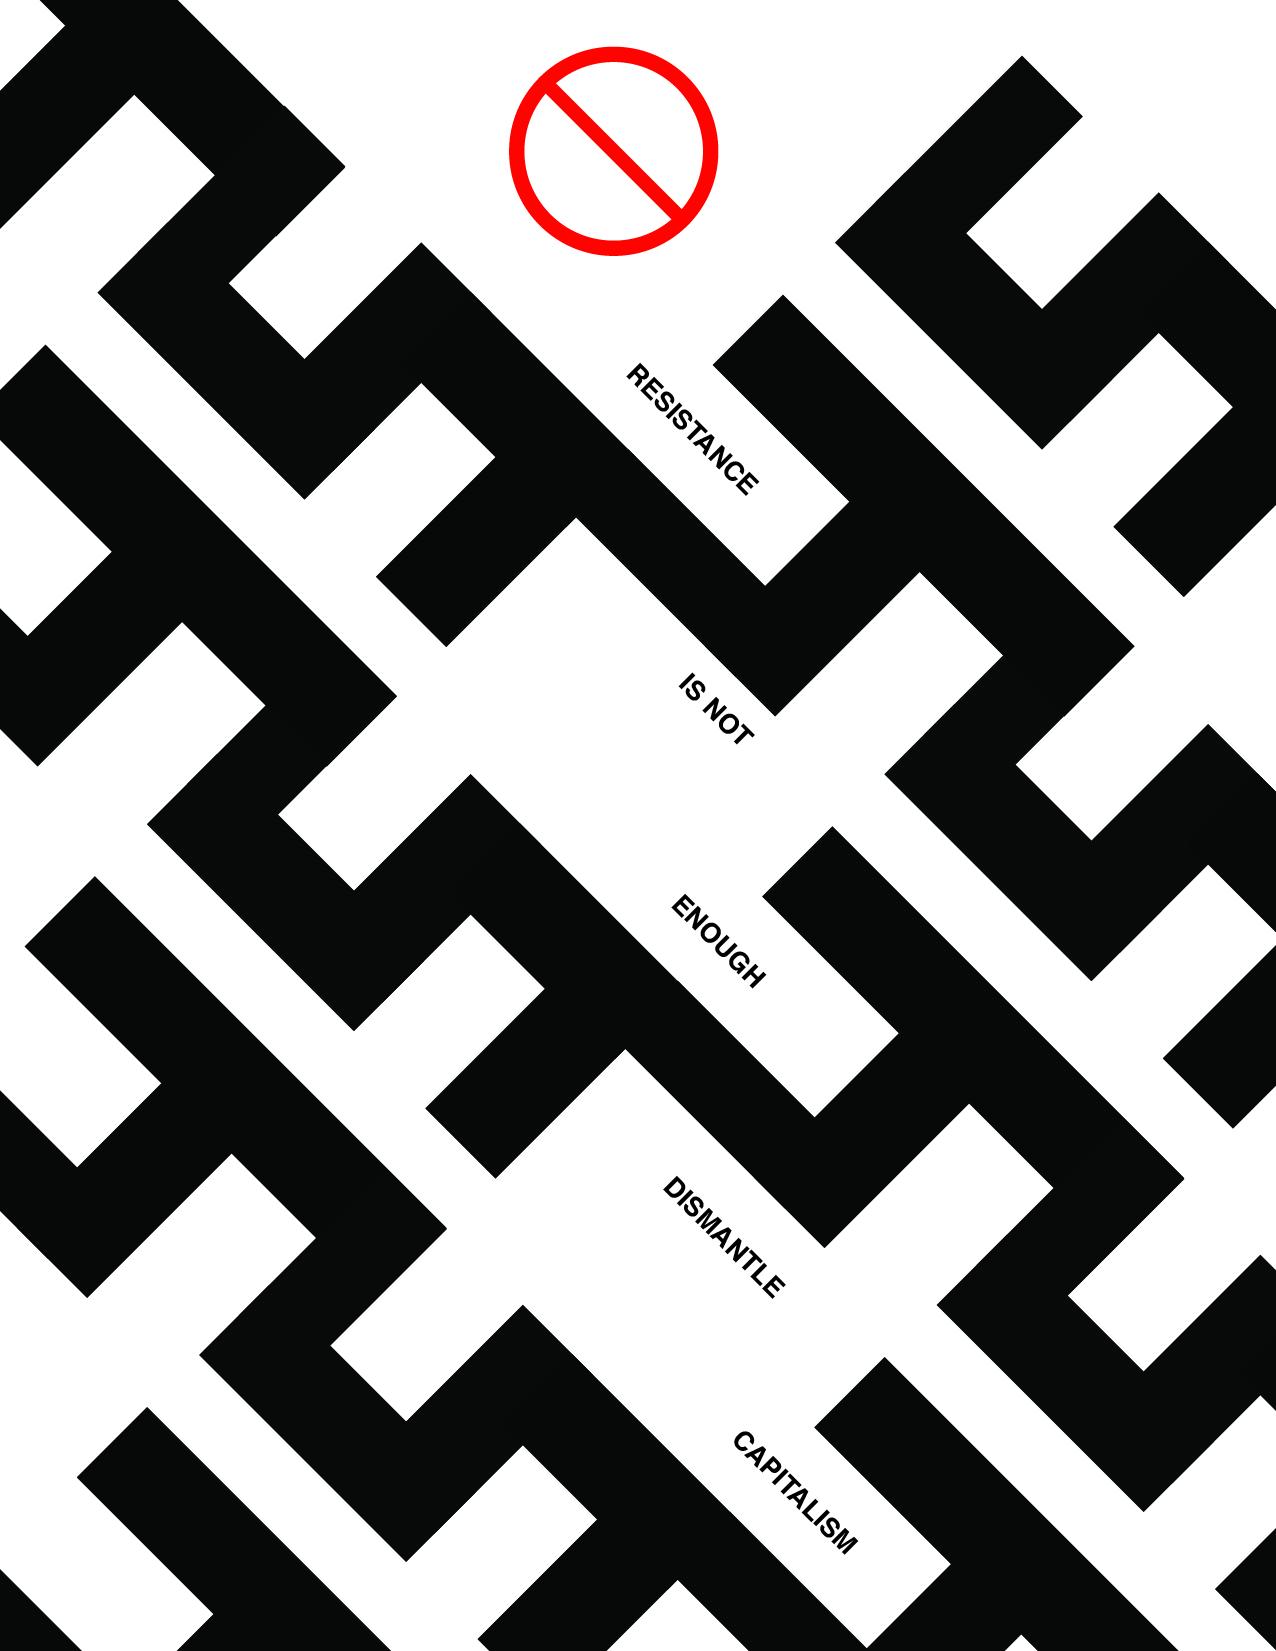 artist dismantle capitalism posters propoganda-06.jpg